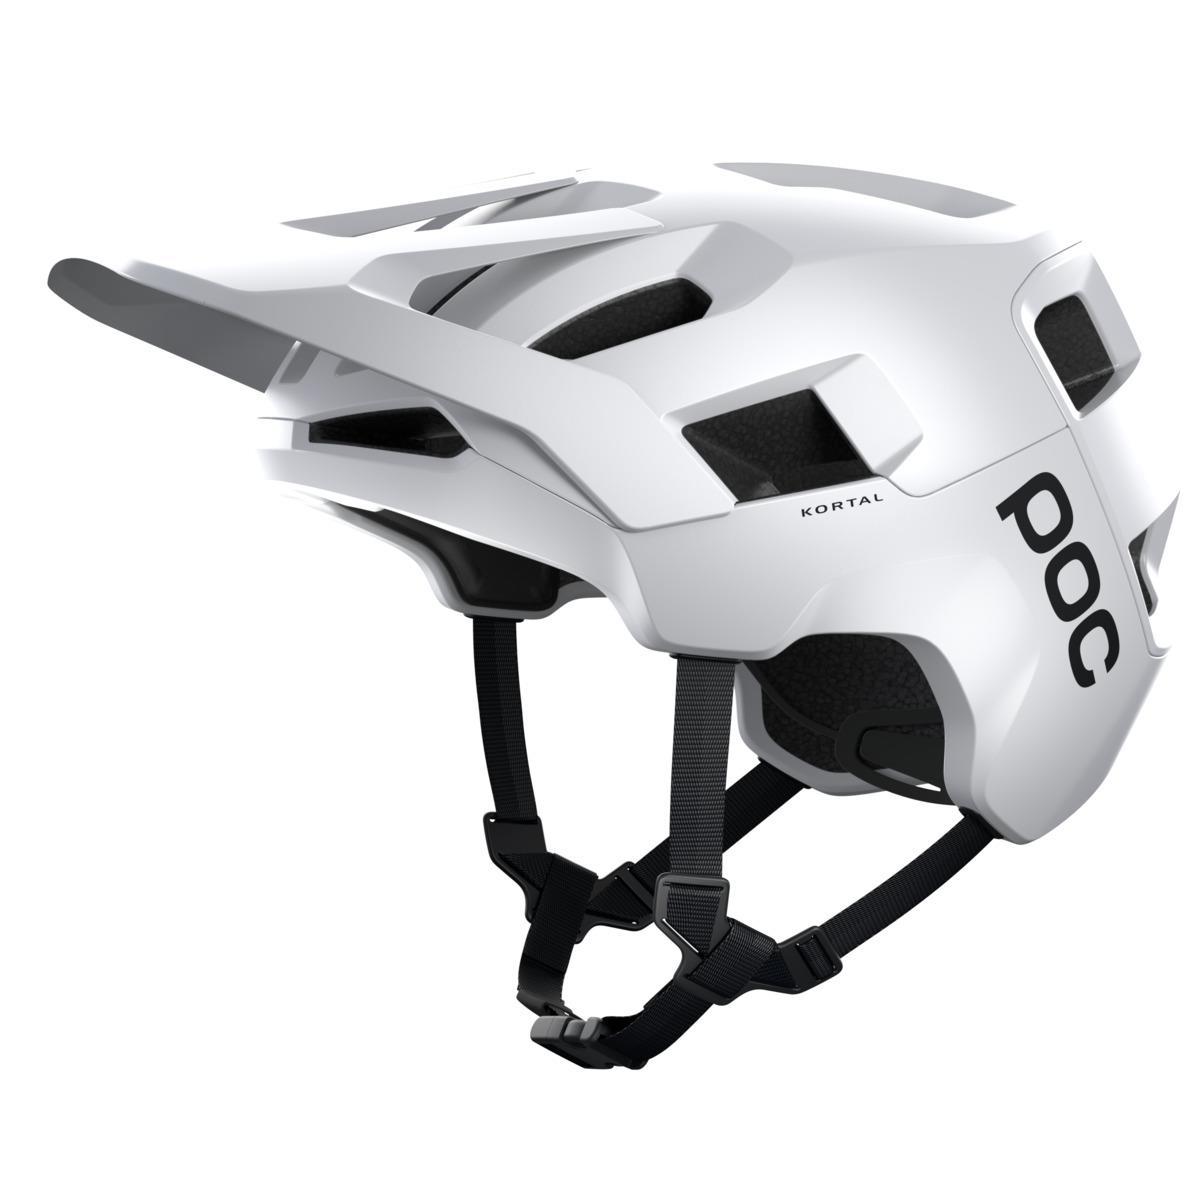 Helmet Kortal Hydrogen White Matt Size XS-S (51-54cm)